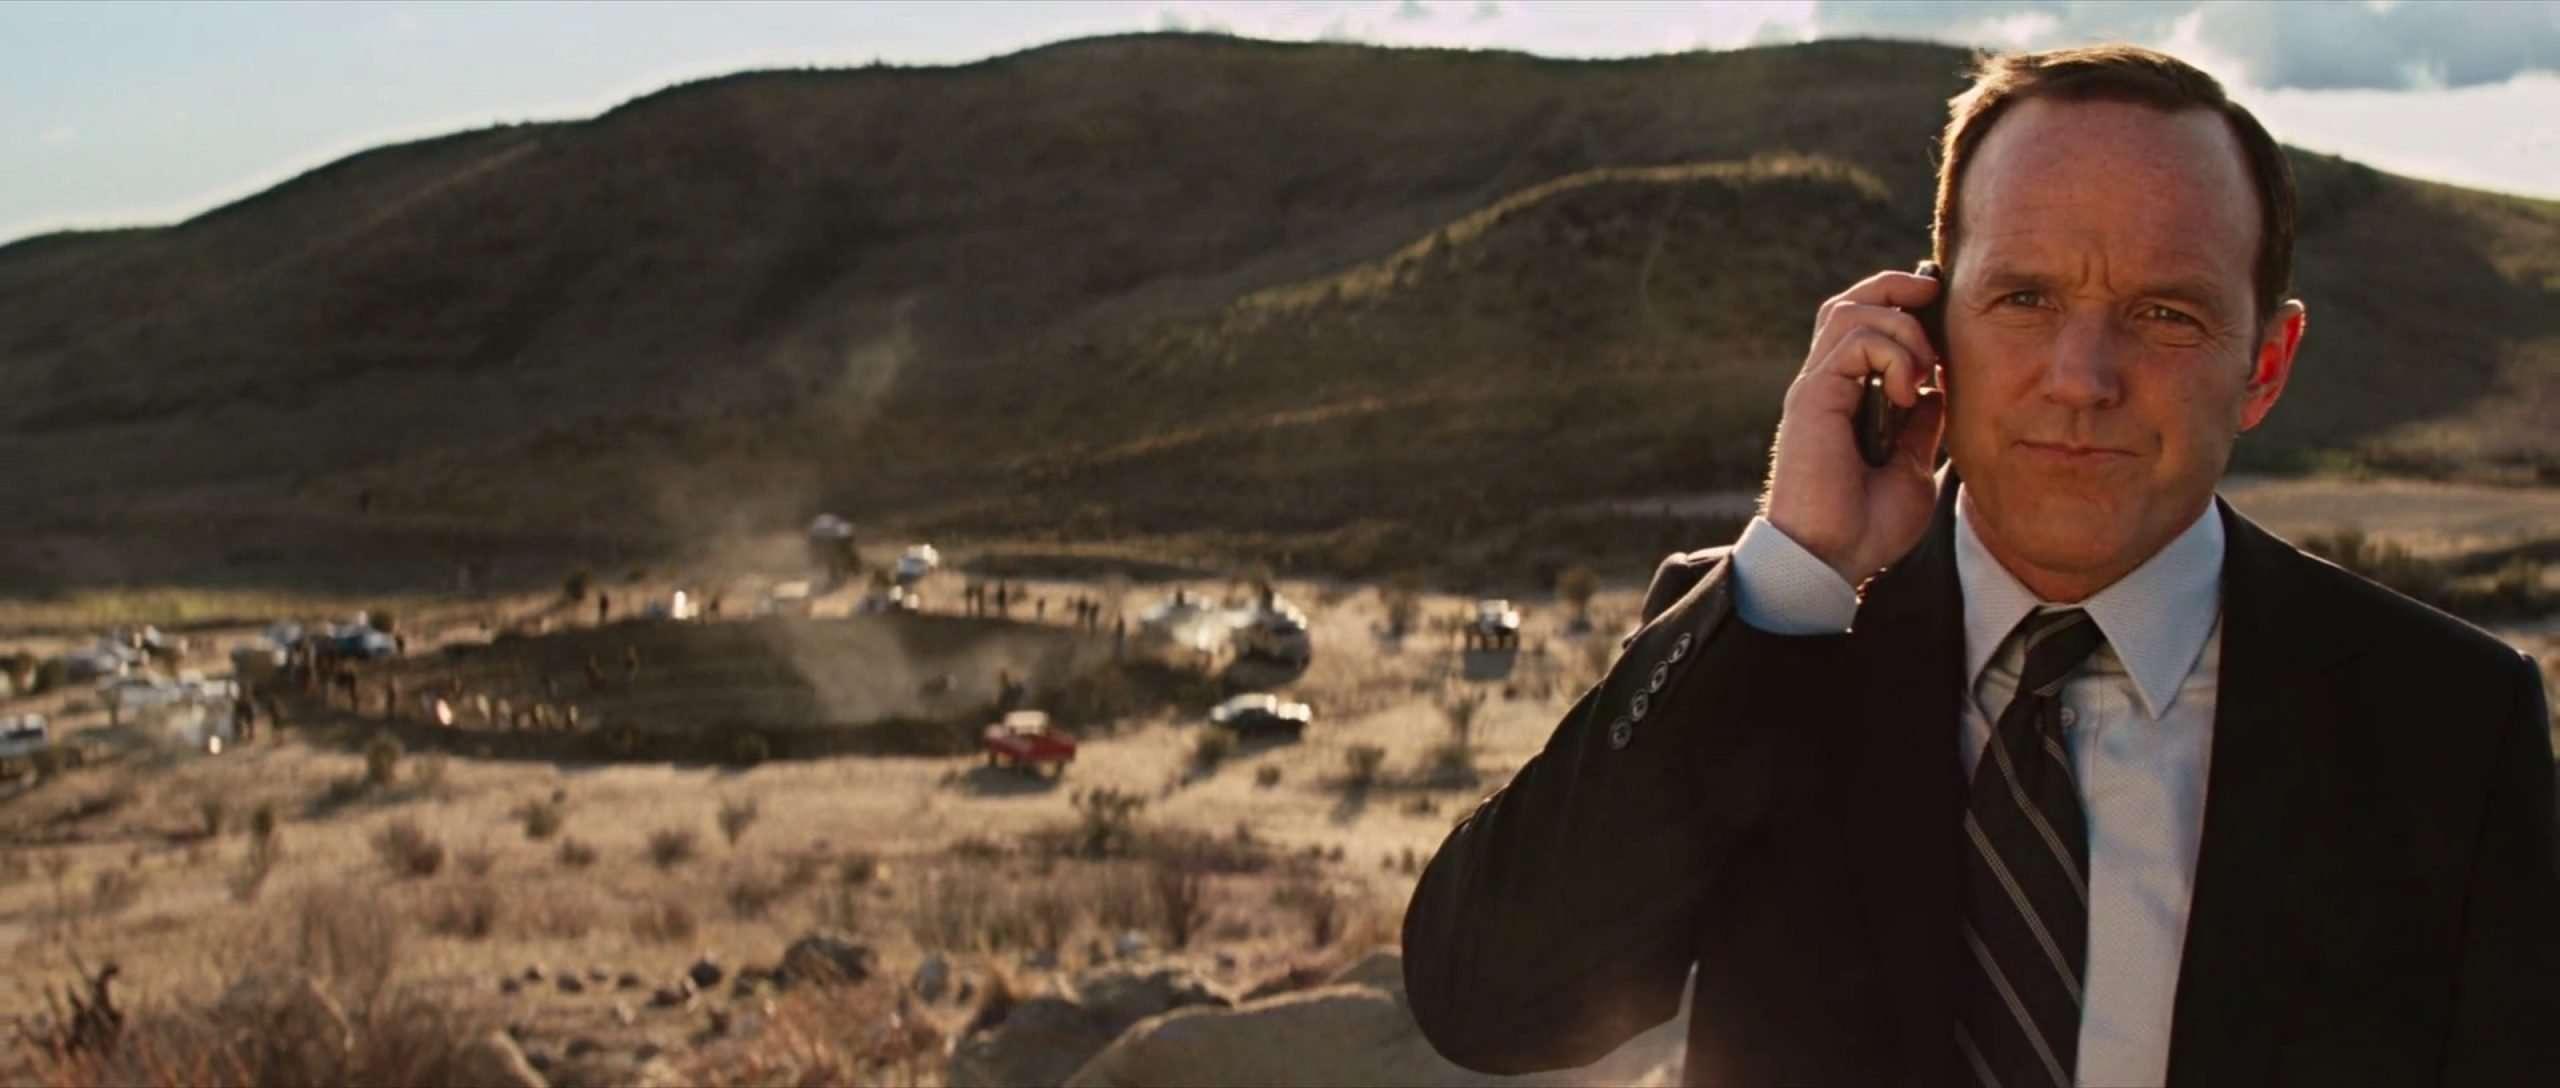 Clark-Gregg-as-Agent-Coulson-scaled.jpg